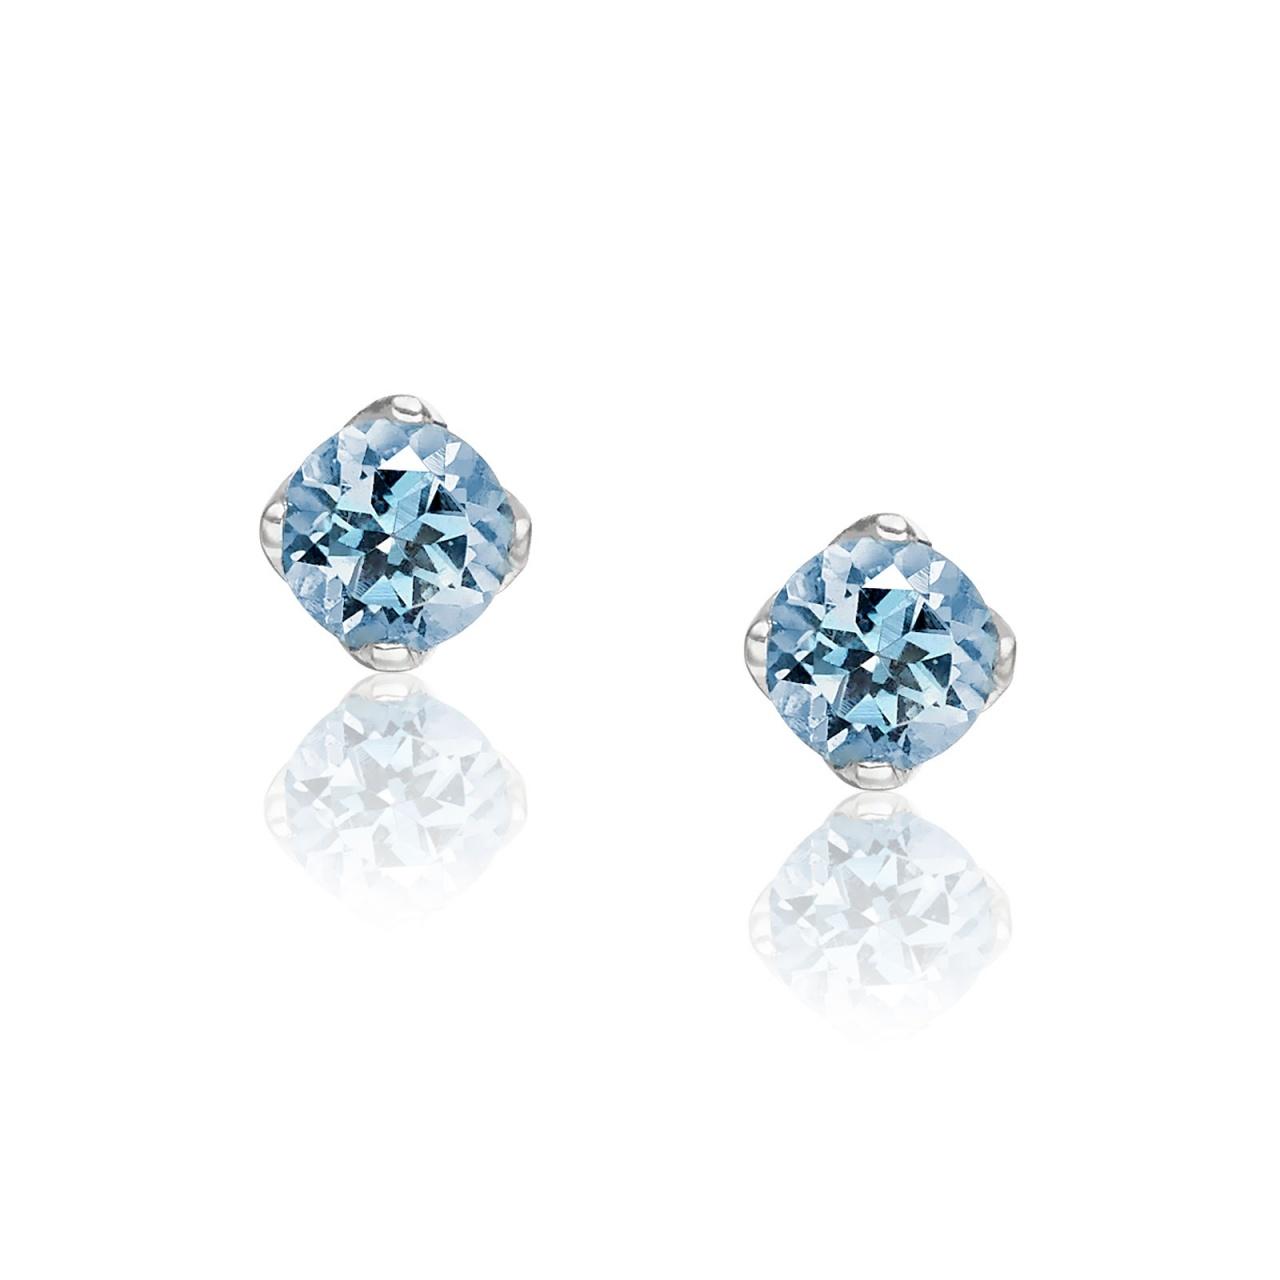 Lief Aquamarine Earrings in White Gold with Akoya Pearls-AEWRAQ0495-1